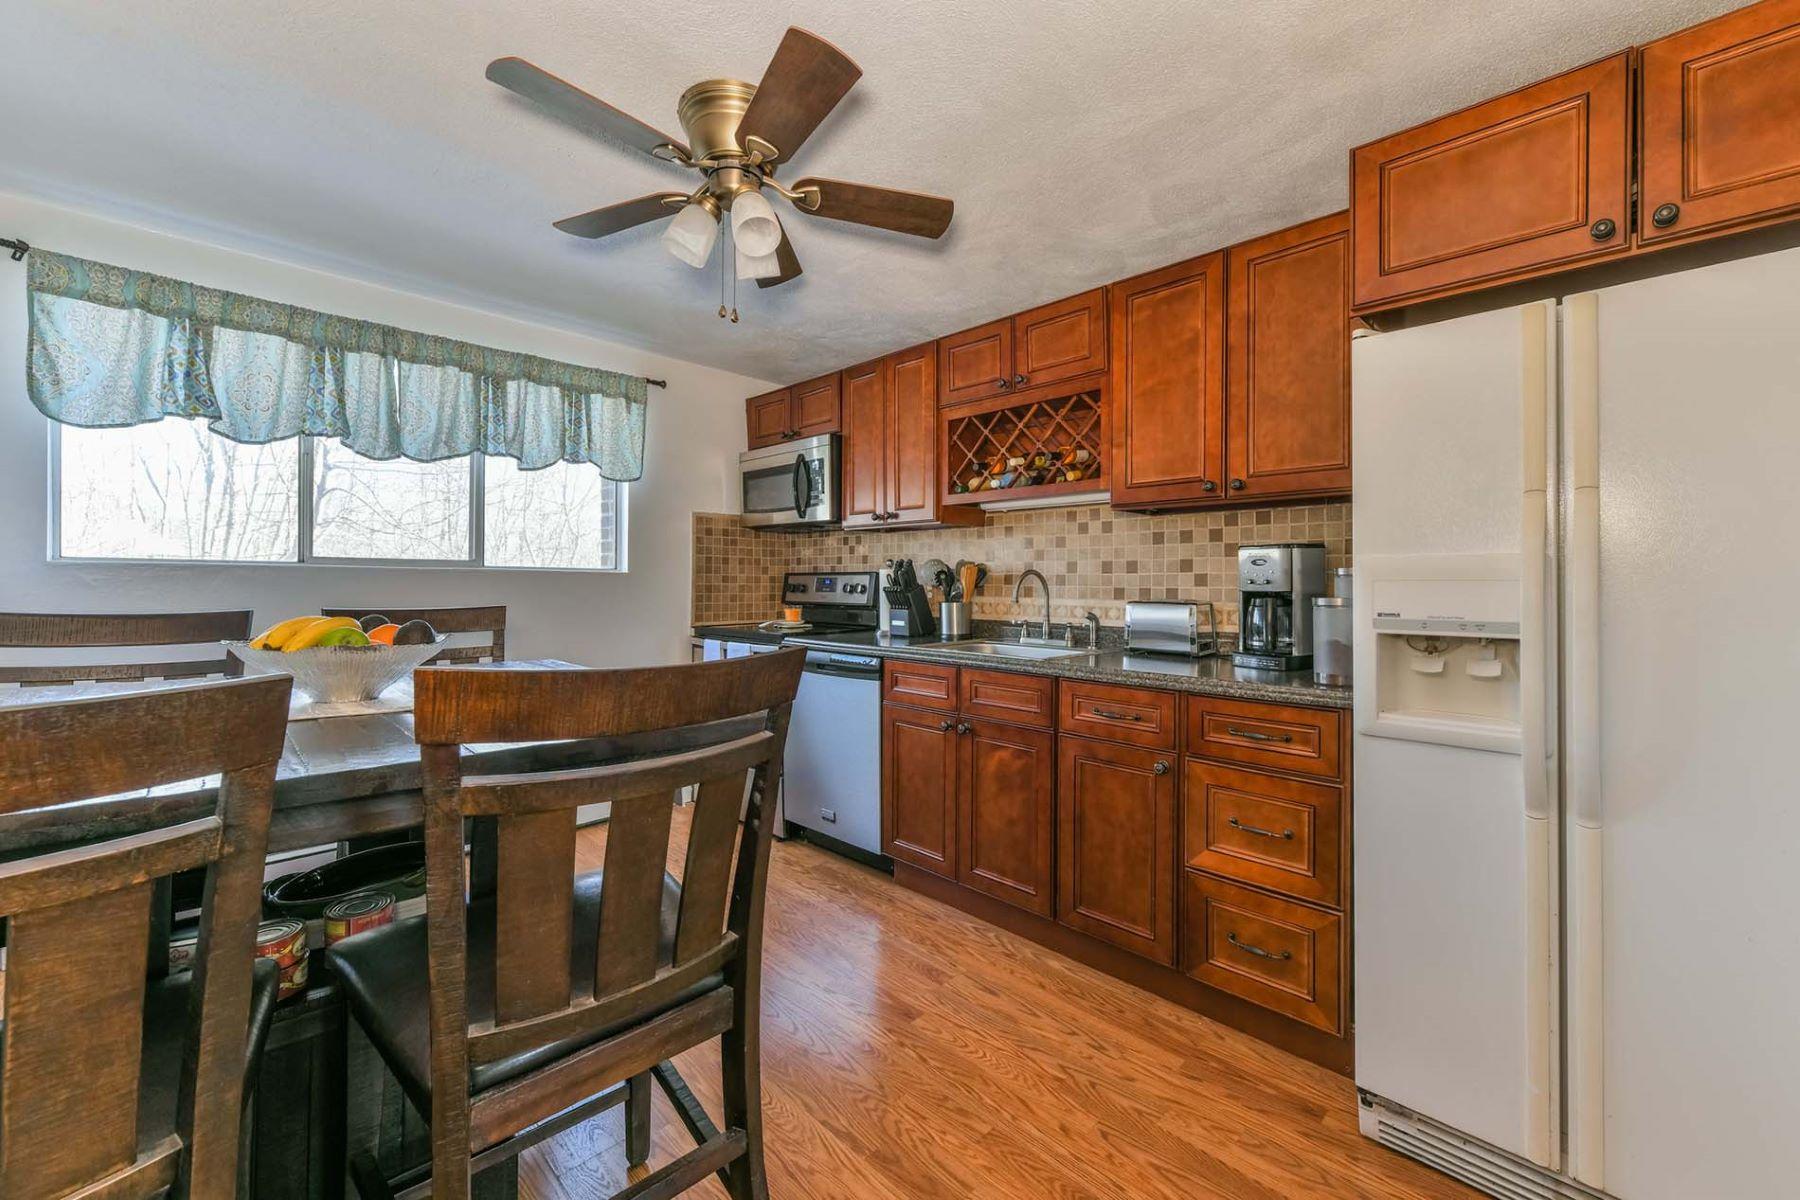 Condominium for Sale at 9 Woodcrest Ct 4, Weymouth 9 Woodcrest Ct 4 Weymouth, Massachusetts 02190 United States